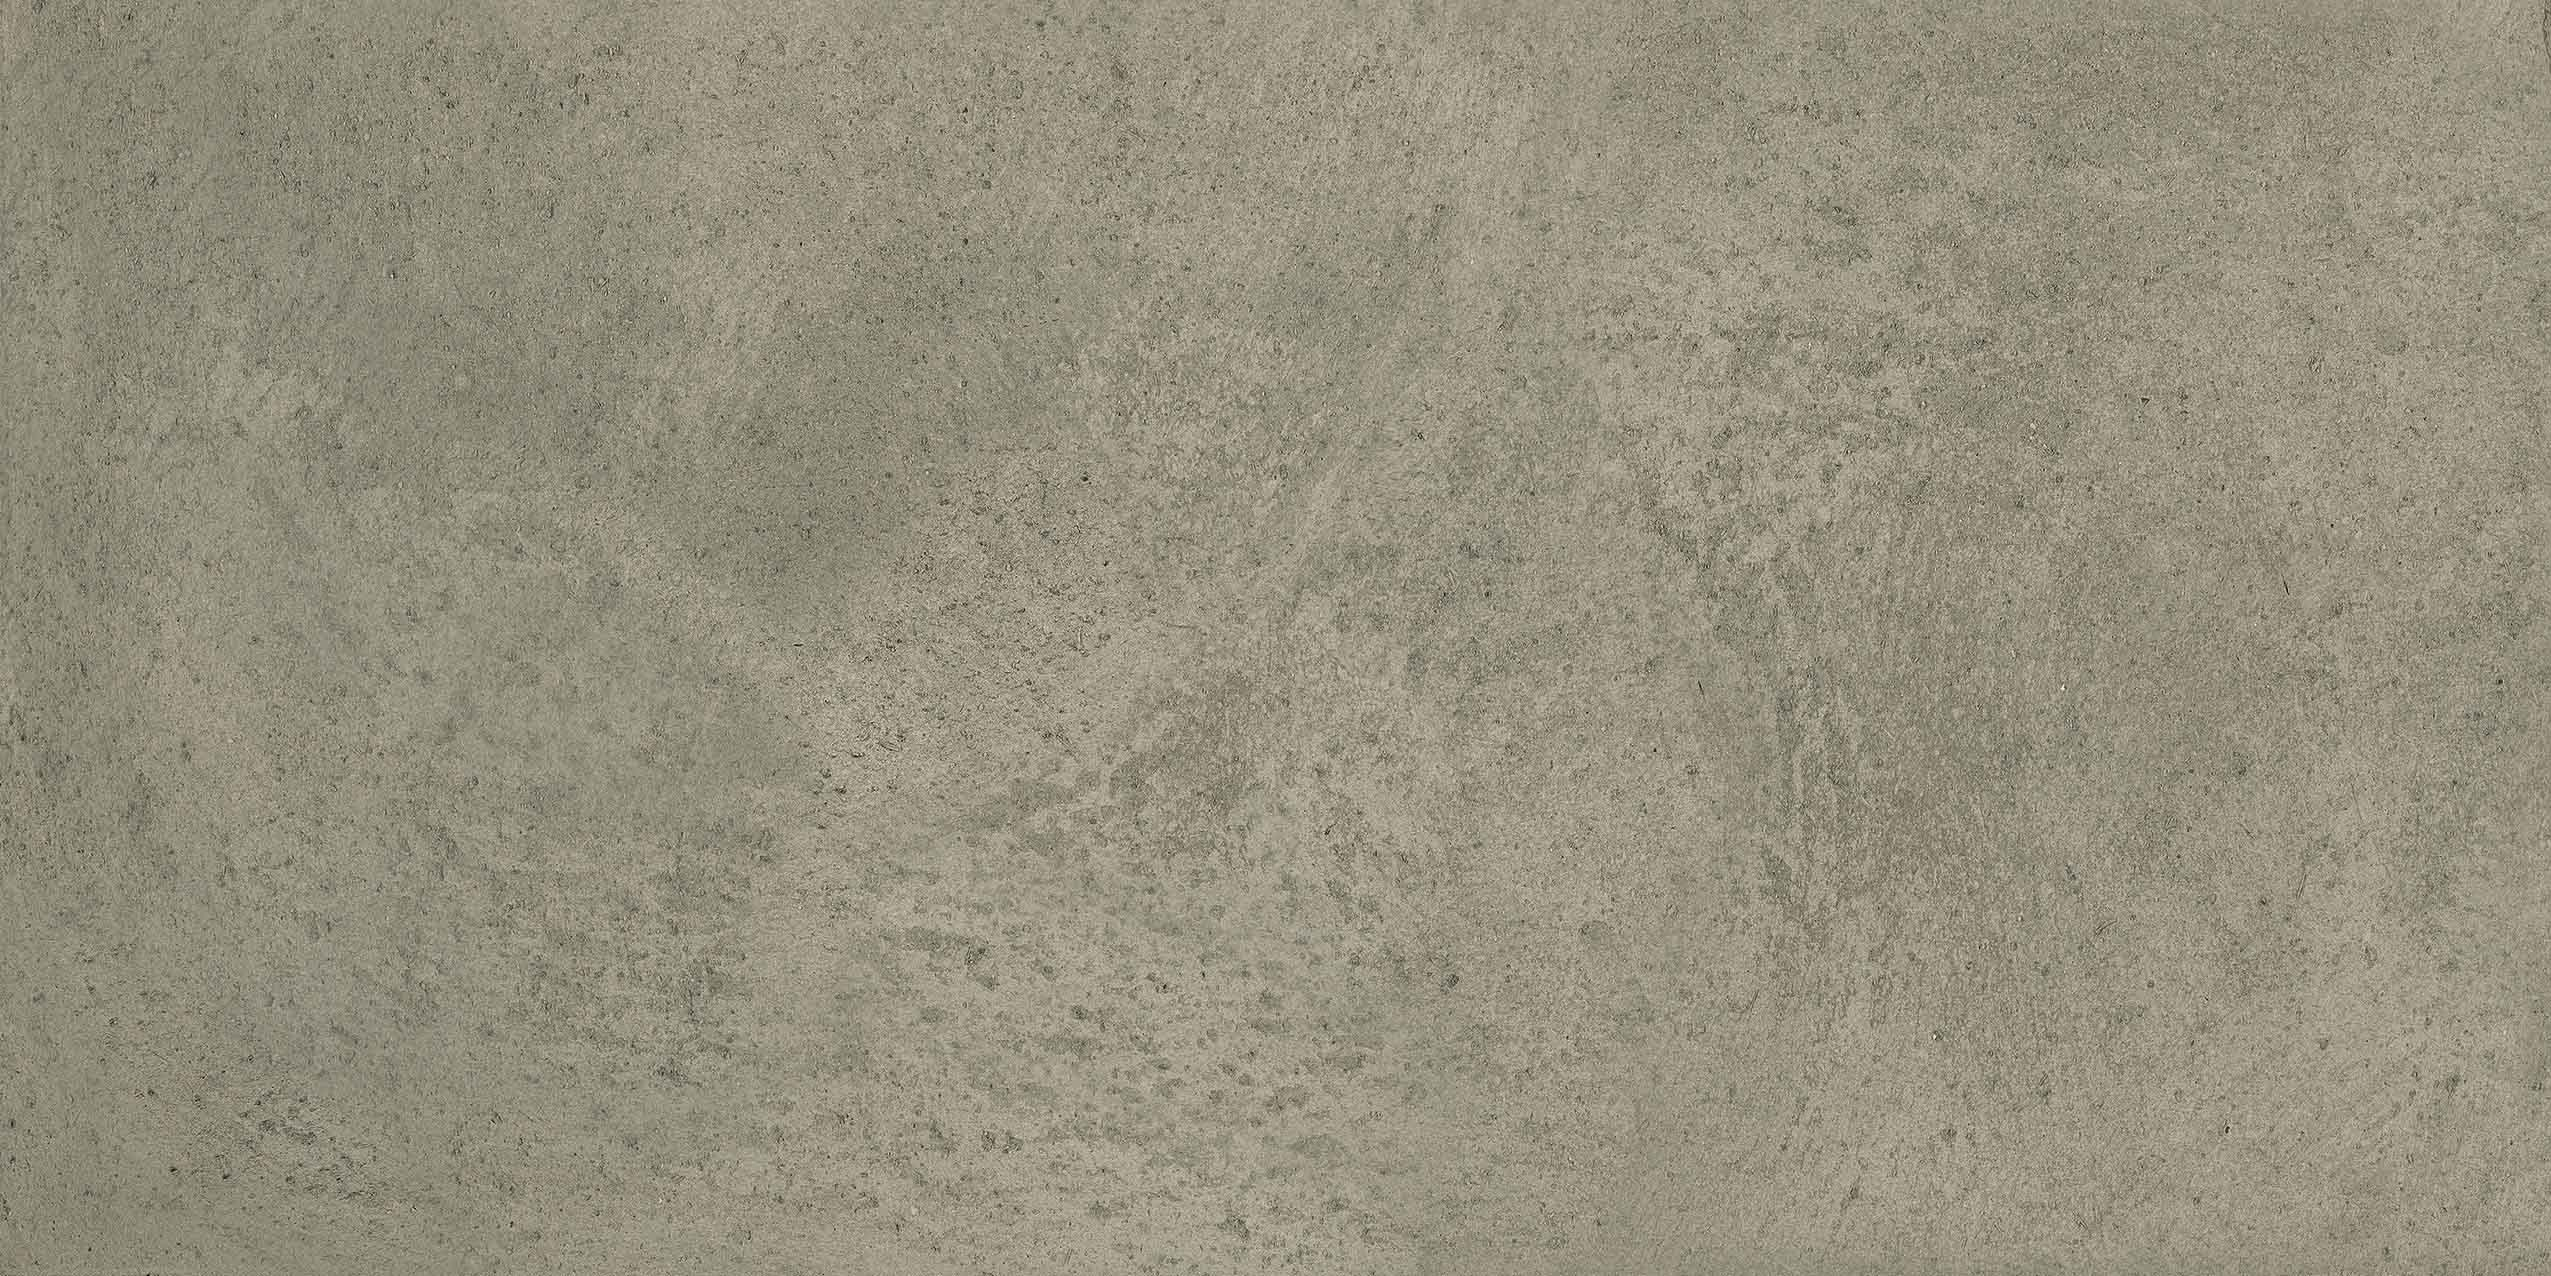 Maps of Cerim Dark Grey Matte 10mm 60 x 120